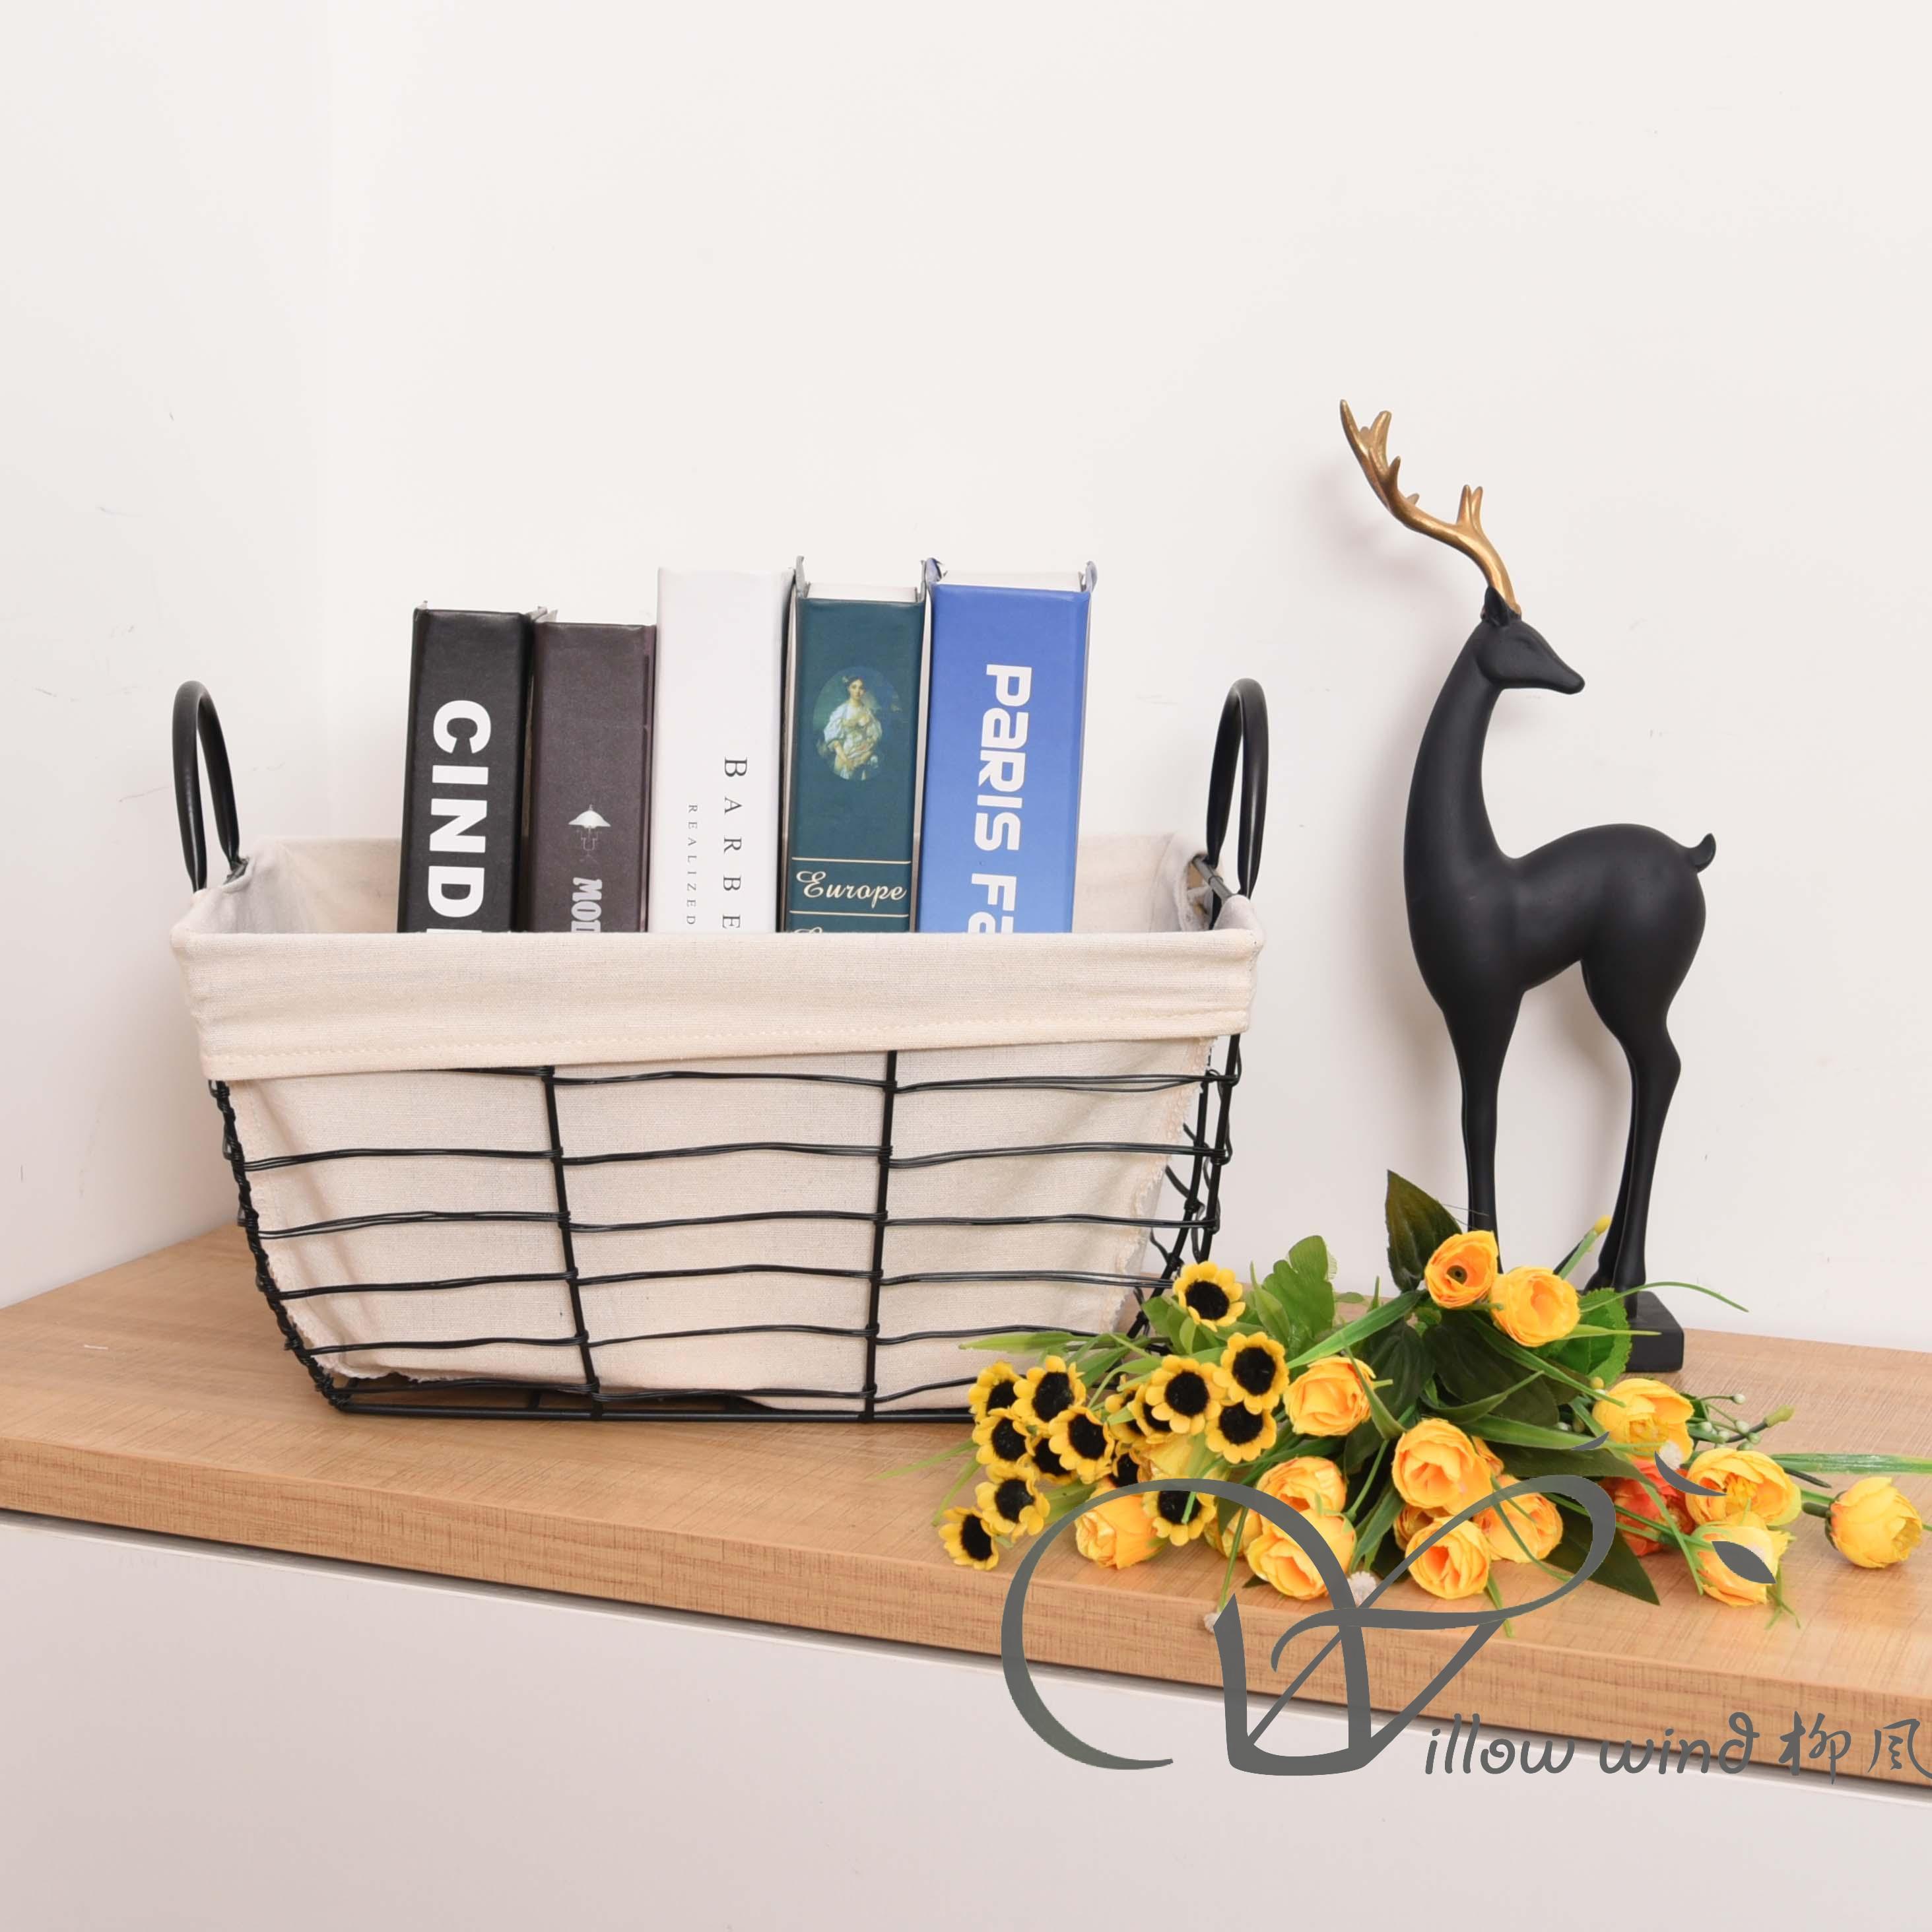 Black Rectangle Wire storage basket Toy Basket Metal Basket